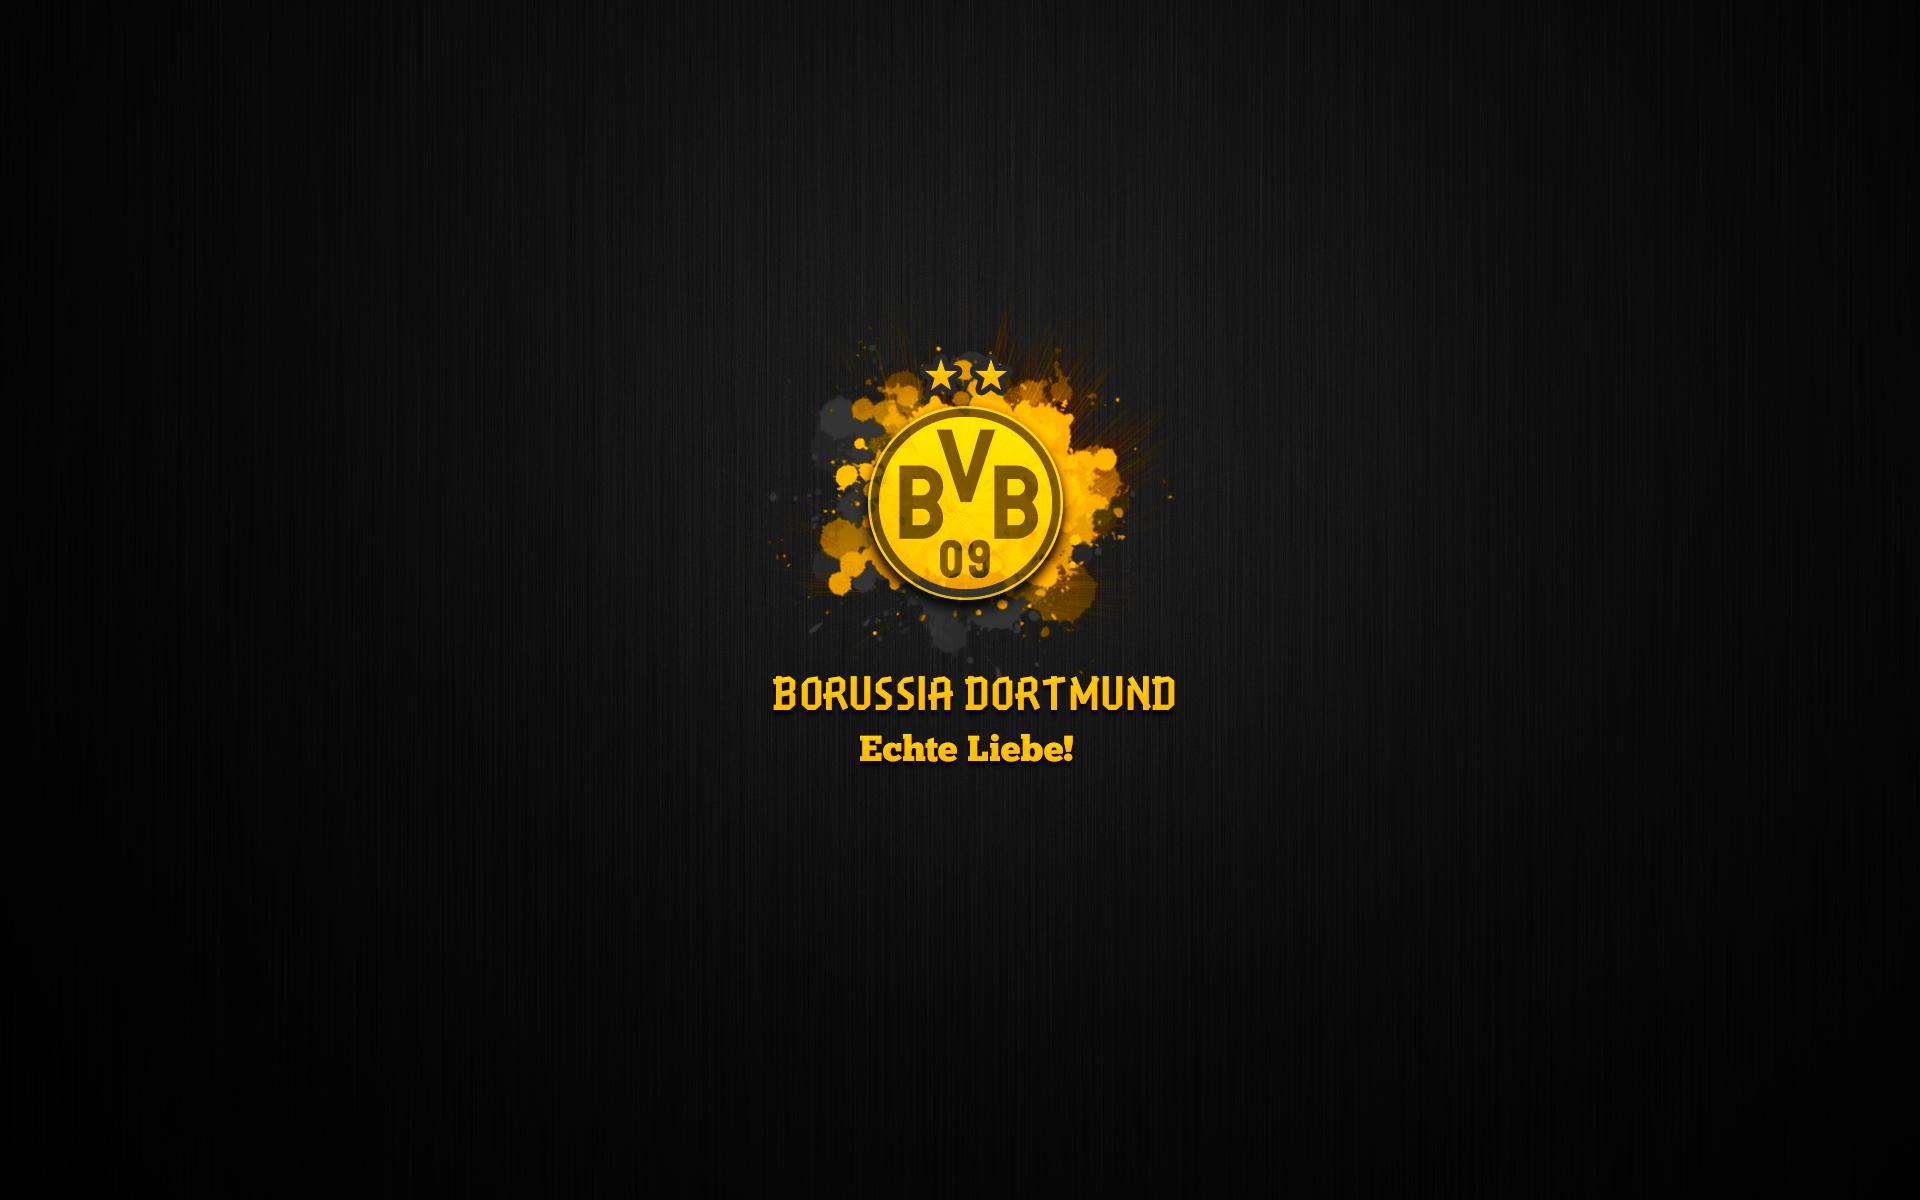 Borussia Dortmund Wallpaper Logo Image Pics